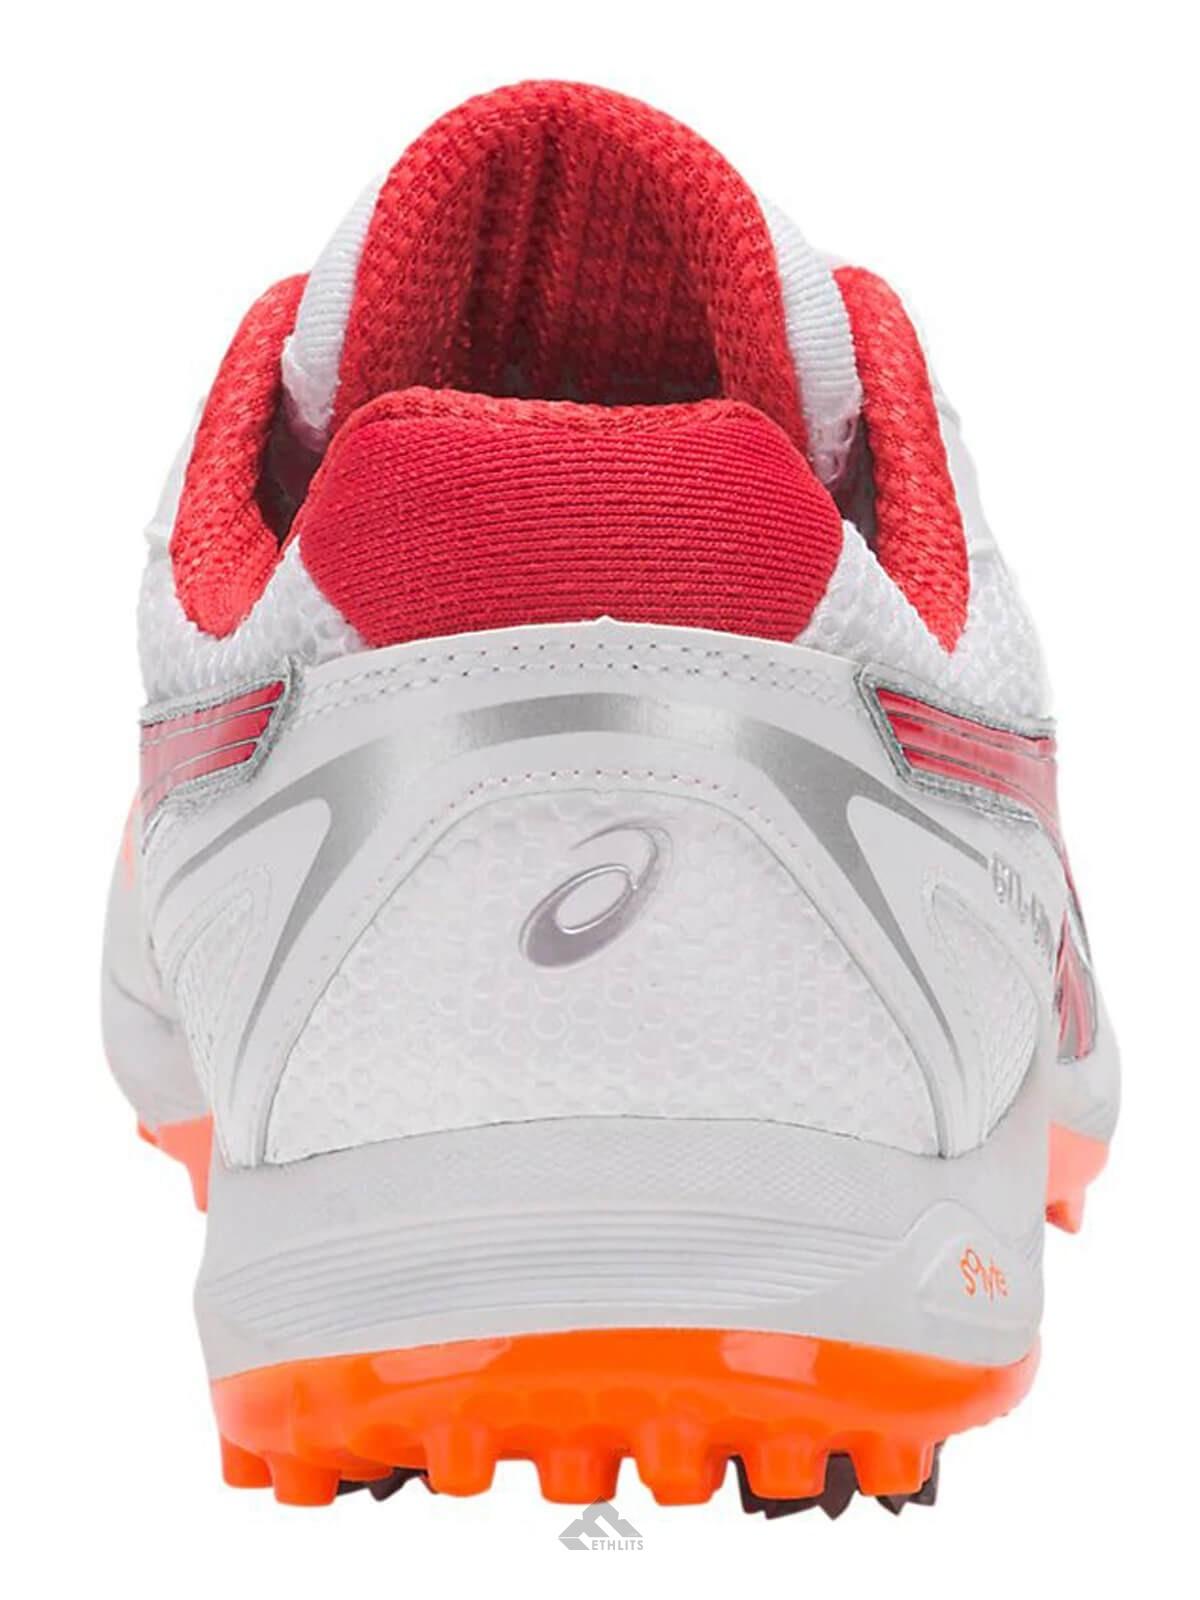 Buy Asics Gel Gully 5 WhiteRed Alert Cricket Spike Shoes